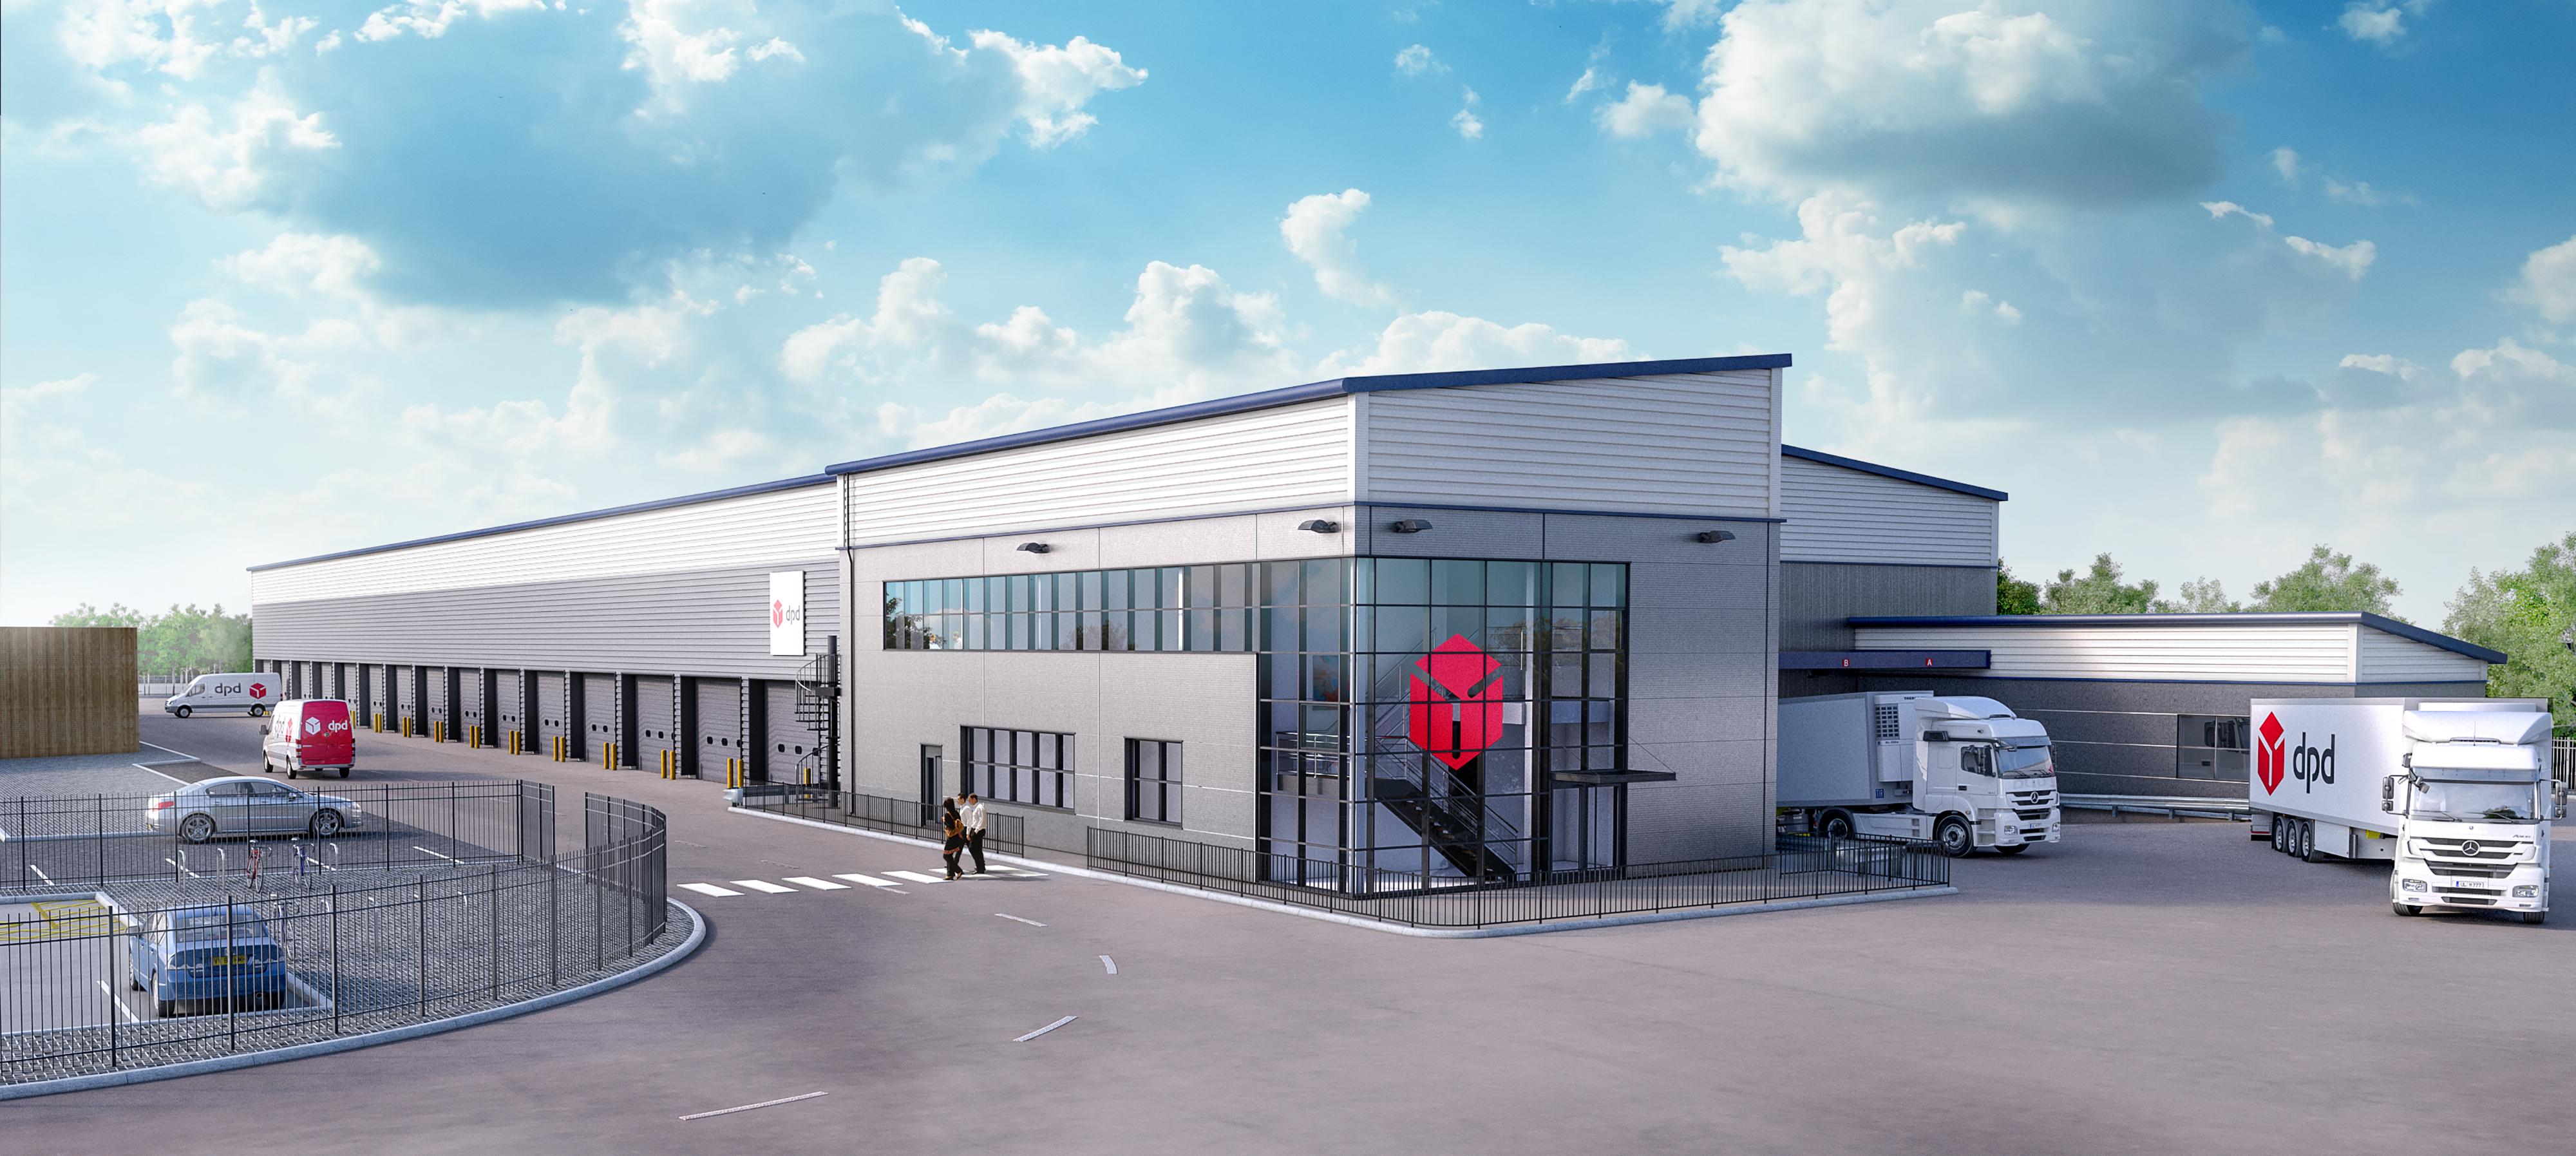 dpd to open 11million oldham dc logistik express fachmedium. Black Bedroom Furniture Sets. Home Design Ideas